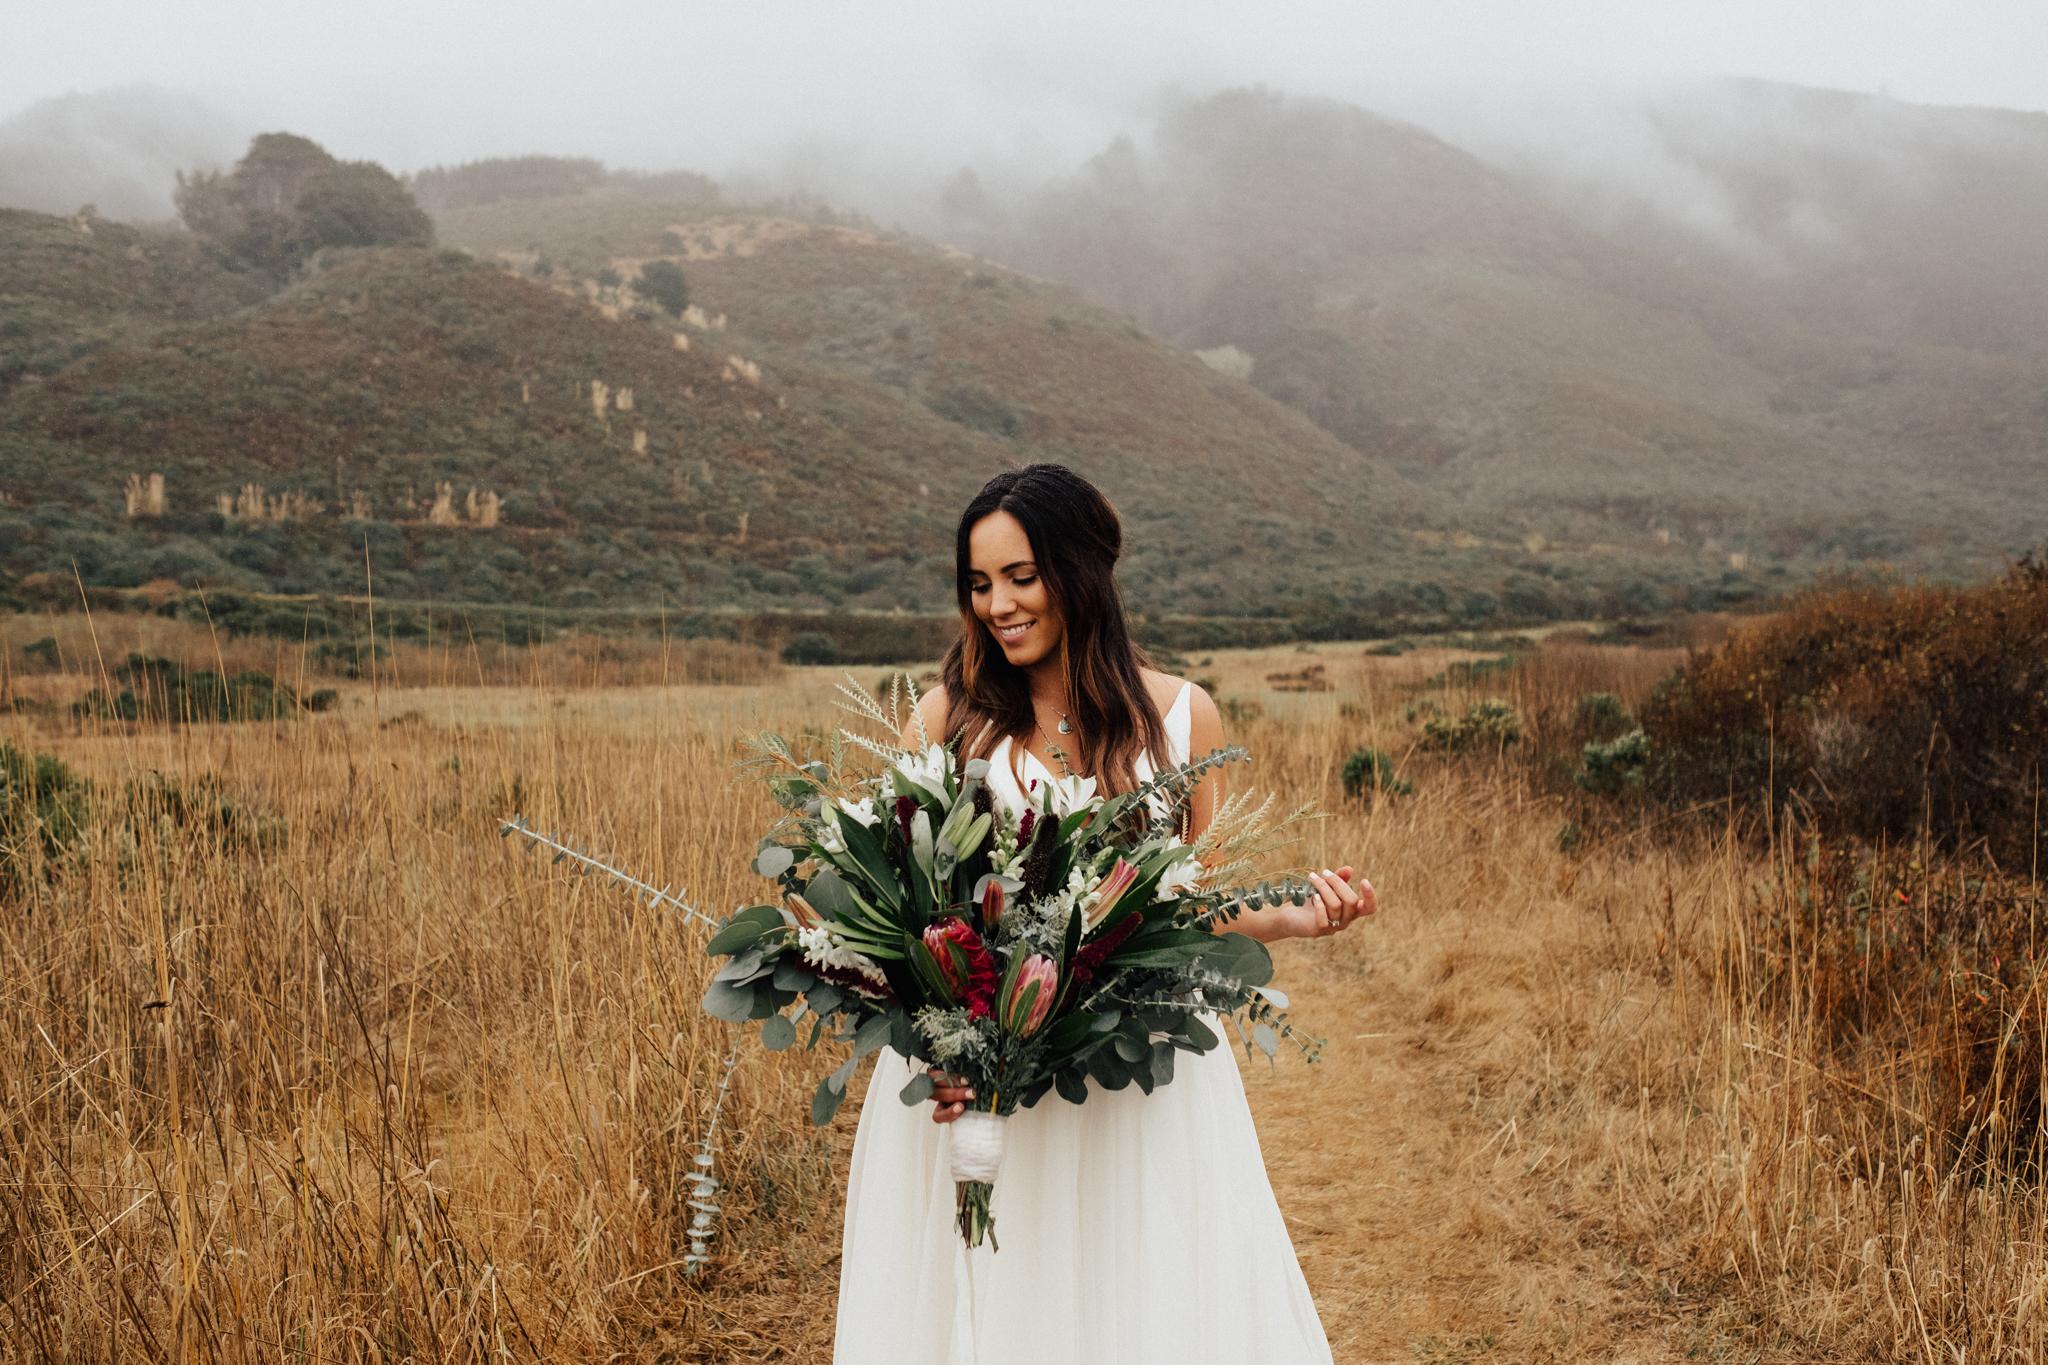 Arizona-Adventure-Elopement-Wedding-Photographer-35.jpg